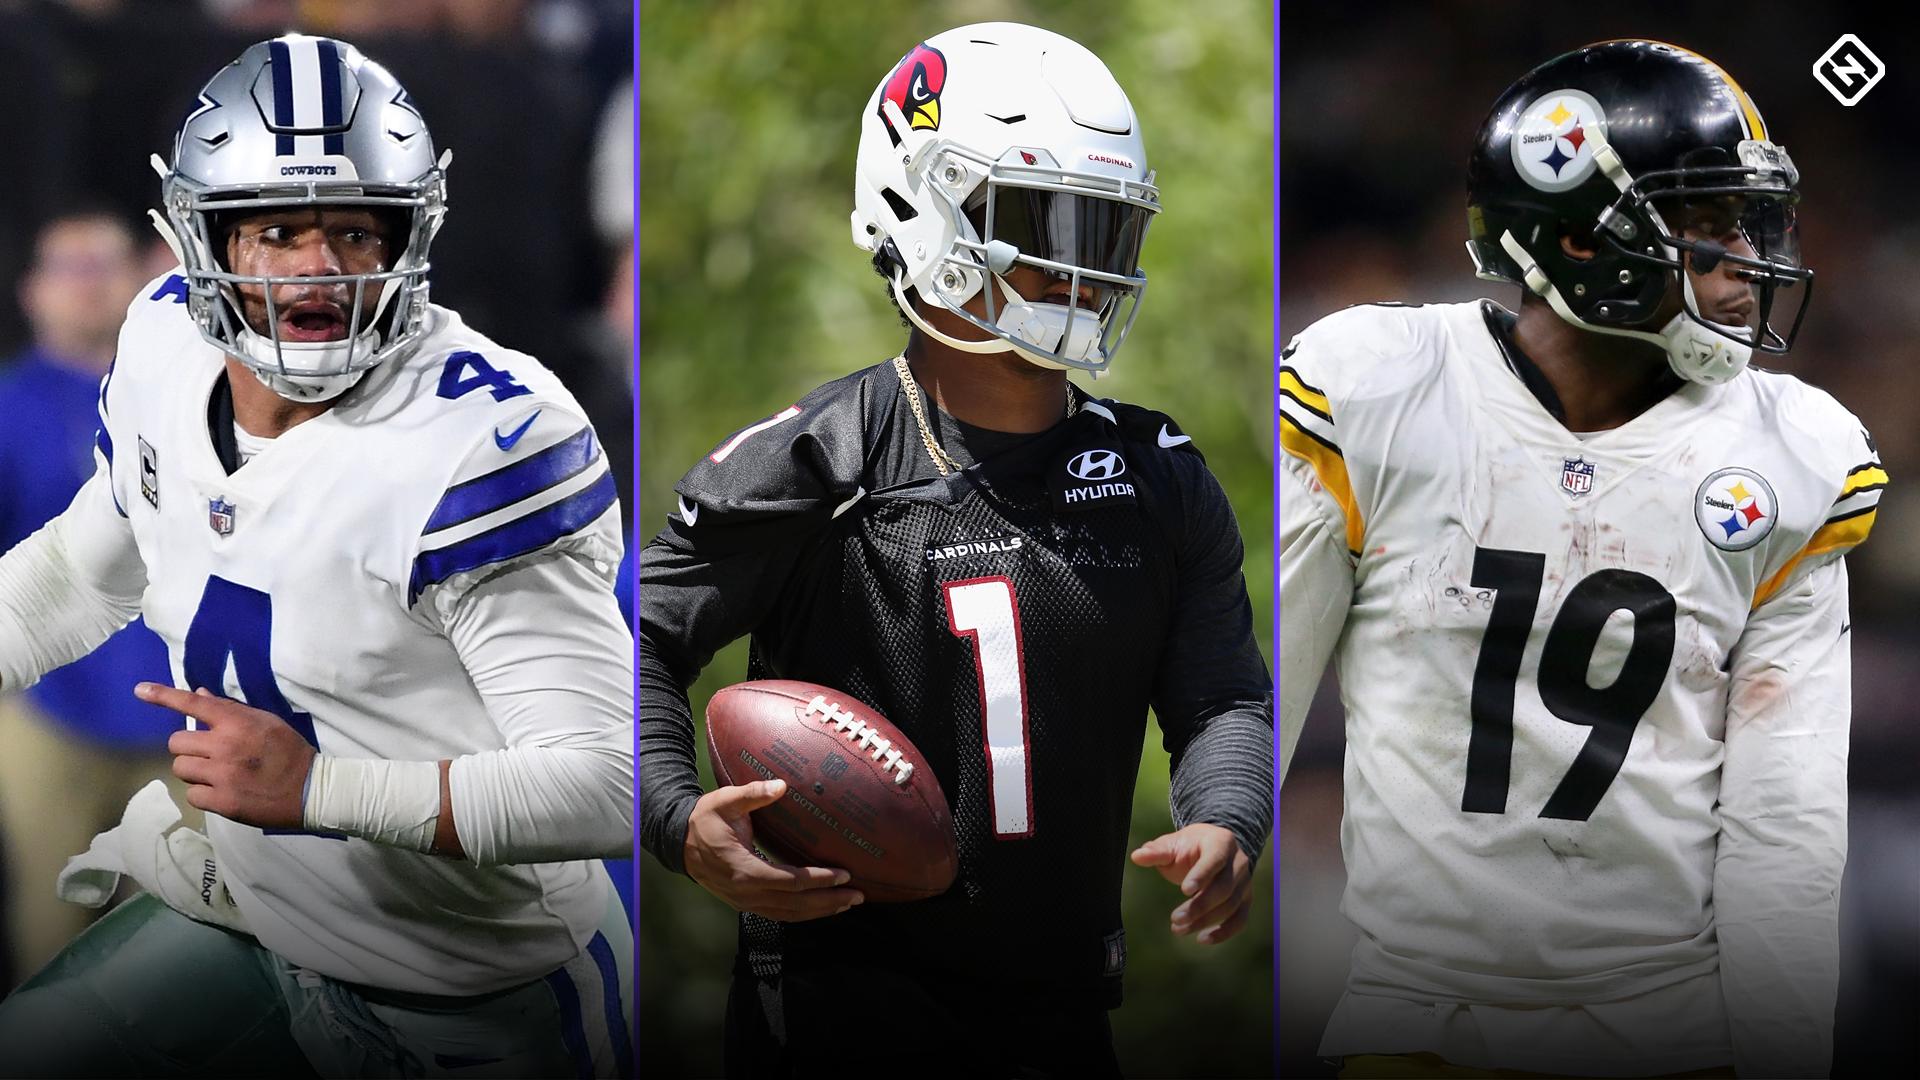 NFL preseason scores 2019: Week 1 TV schedule, results, live